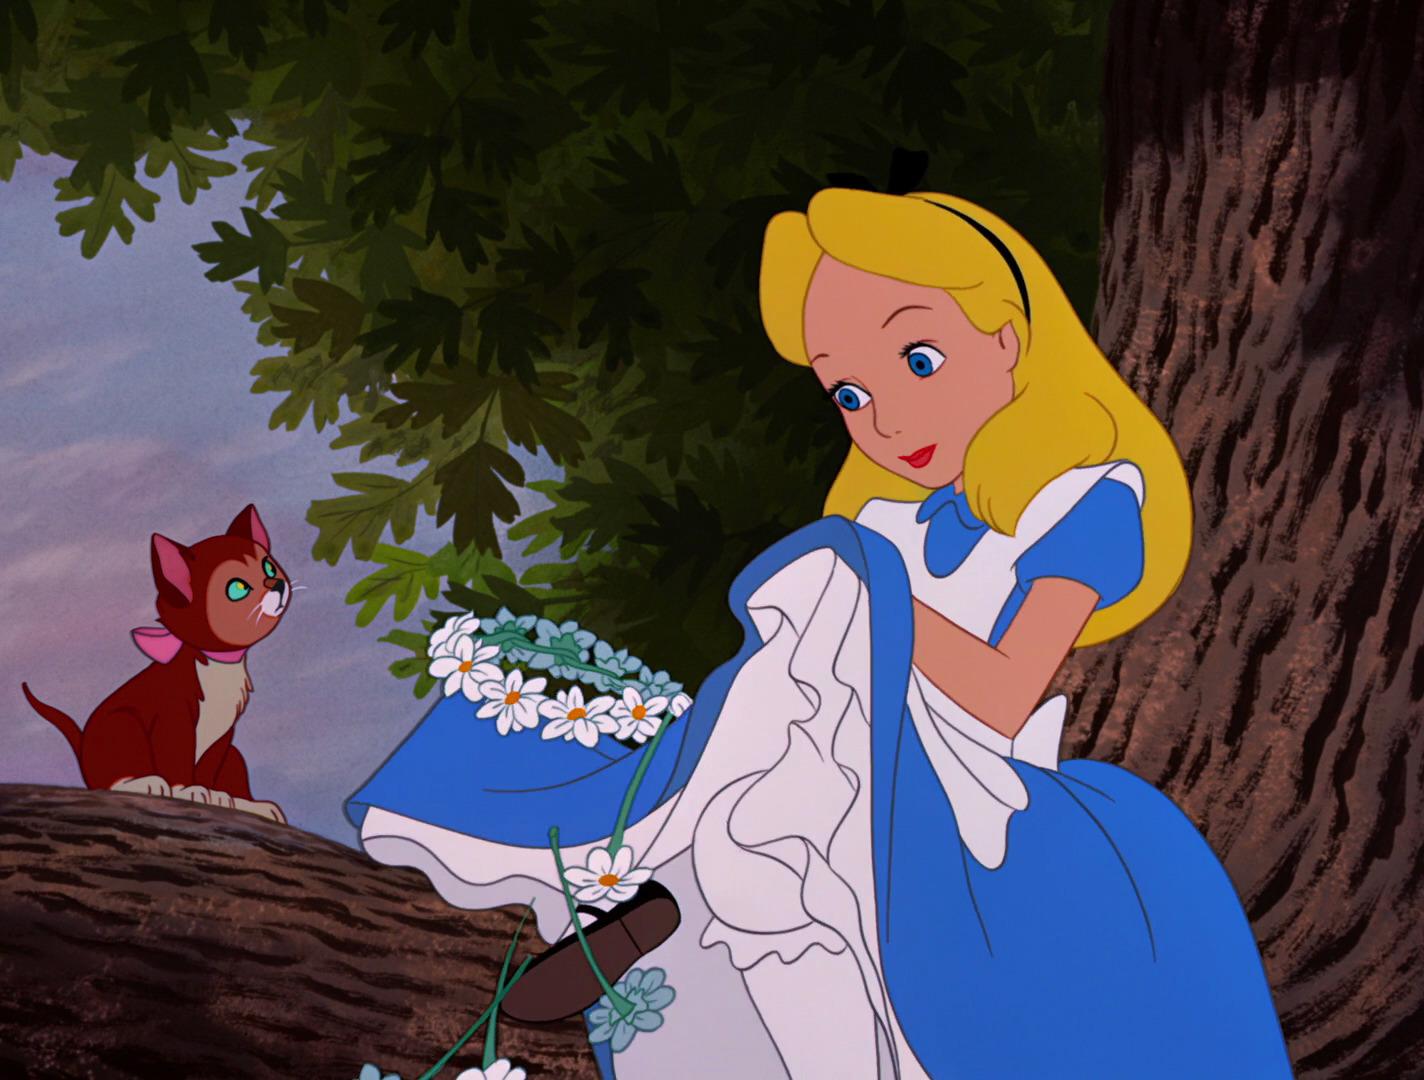 Beginning Scene of Alice in Wonderland